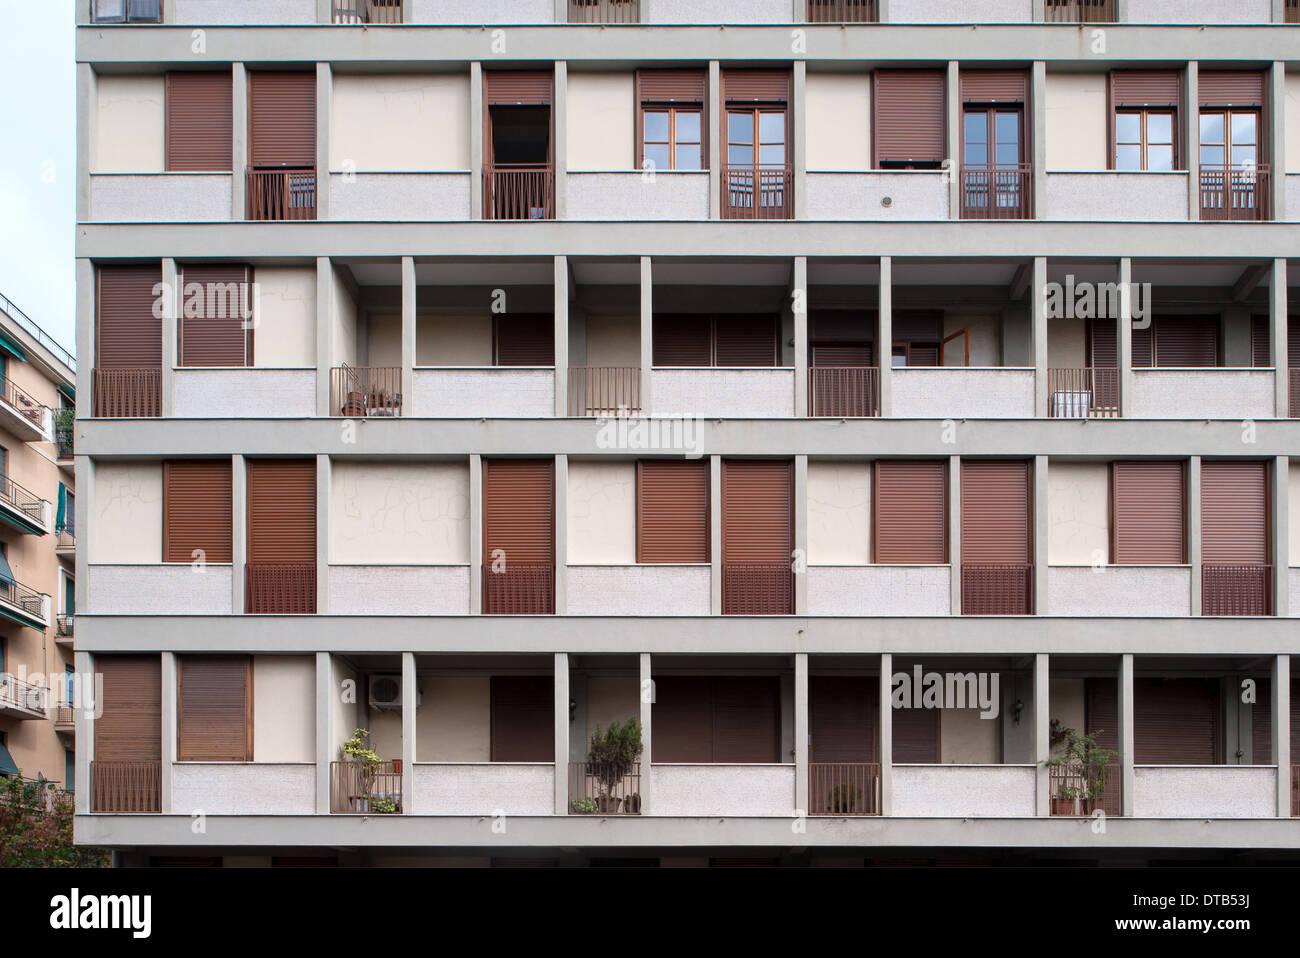 Genoa, Italy, residential buildings in Via Oreste De Gaspari 21 - Stock Image